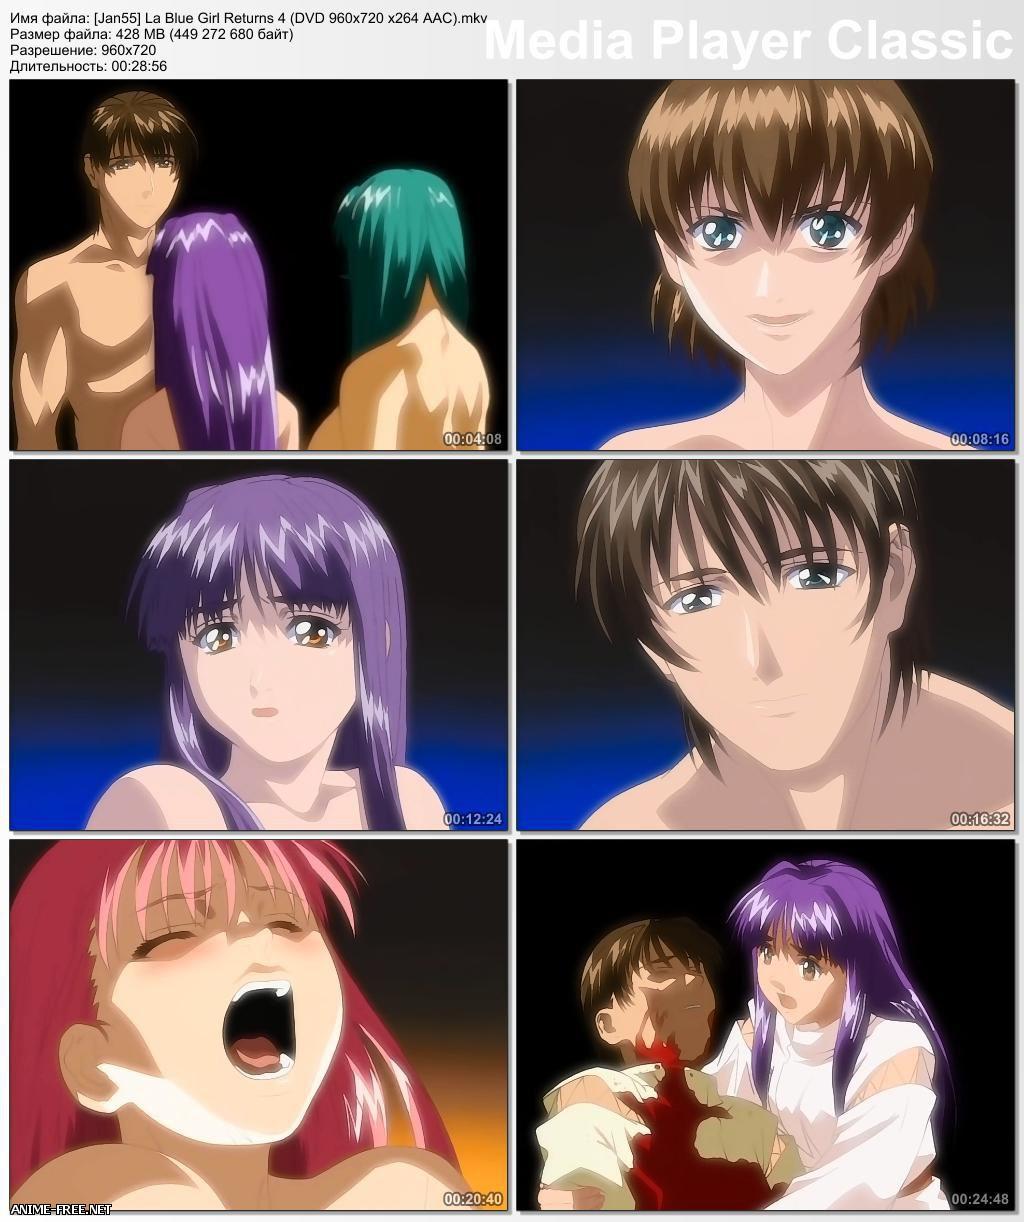 La Blue Girl Returns / Inju Gakuen Fukkatsu / La Blue Girl Returns: Demon Seed / Синяя девочка возвращается [4 из 4] [RUS,ENG,JAP] Anime Hentai